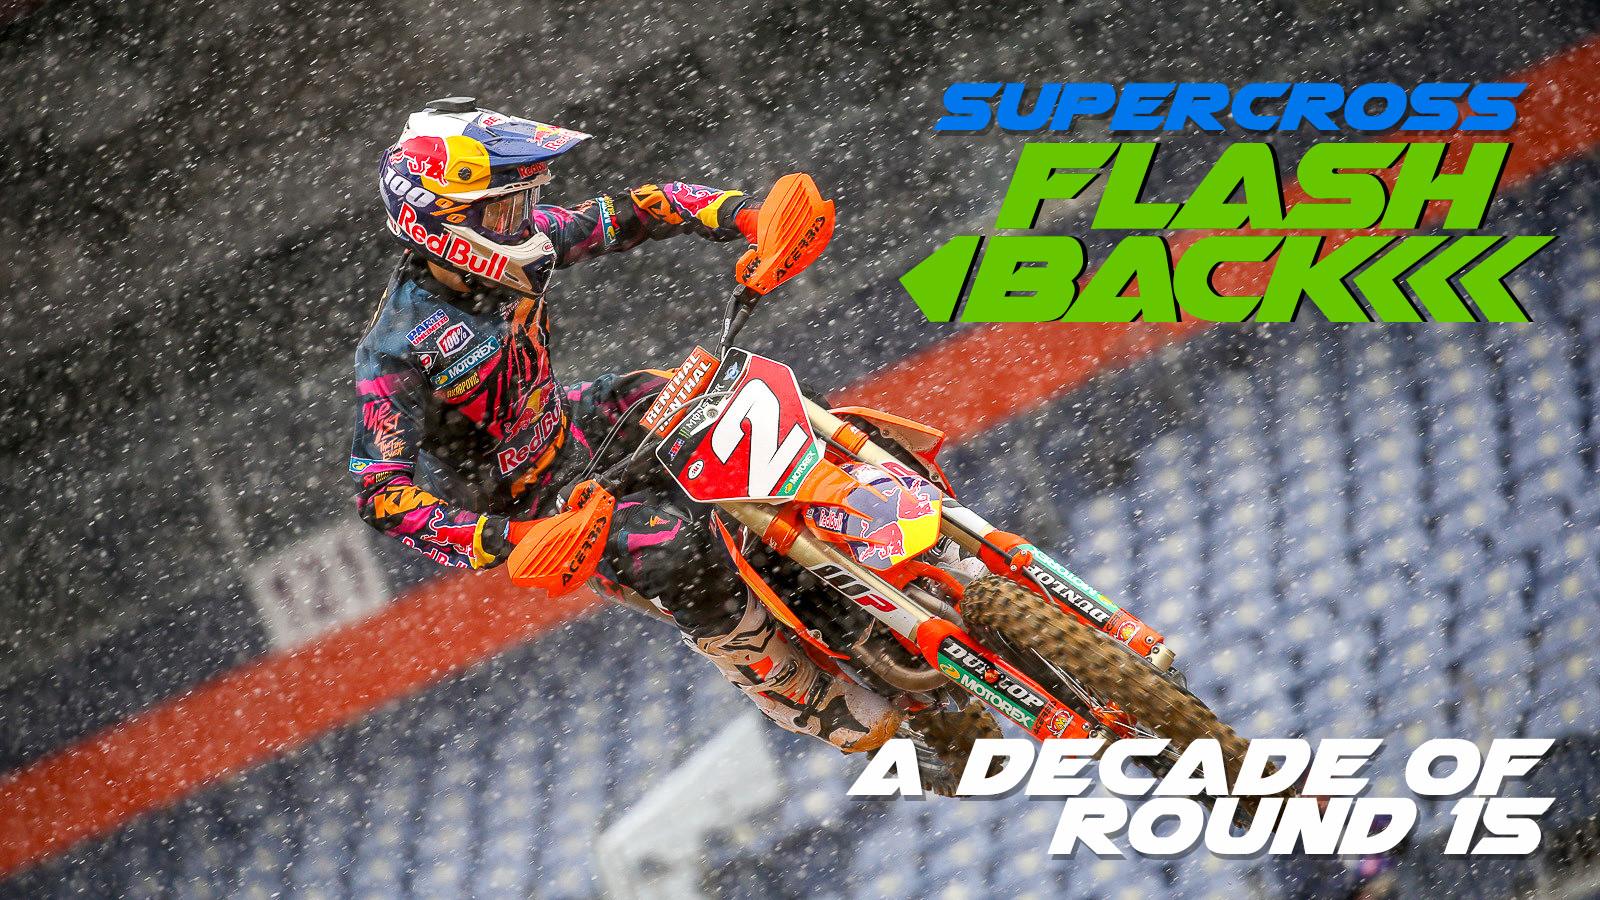 Supercross Flashback: Round 15